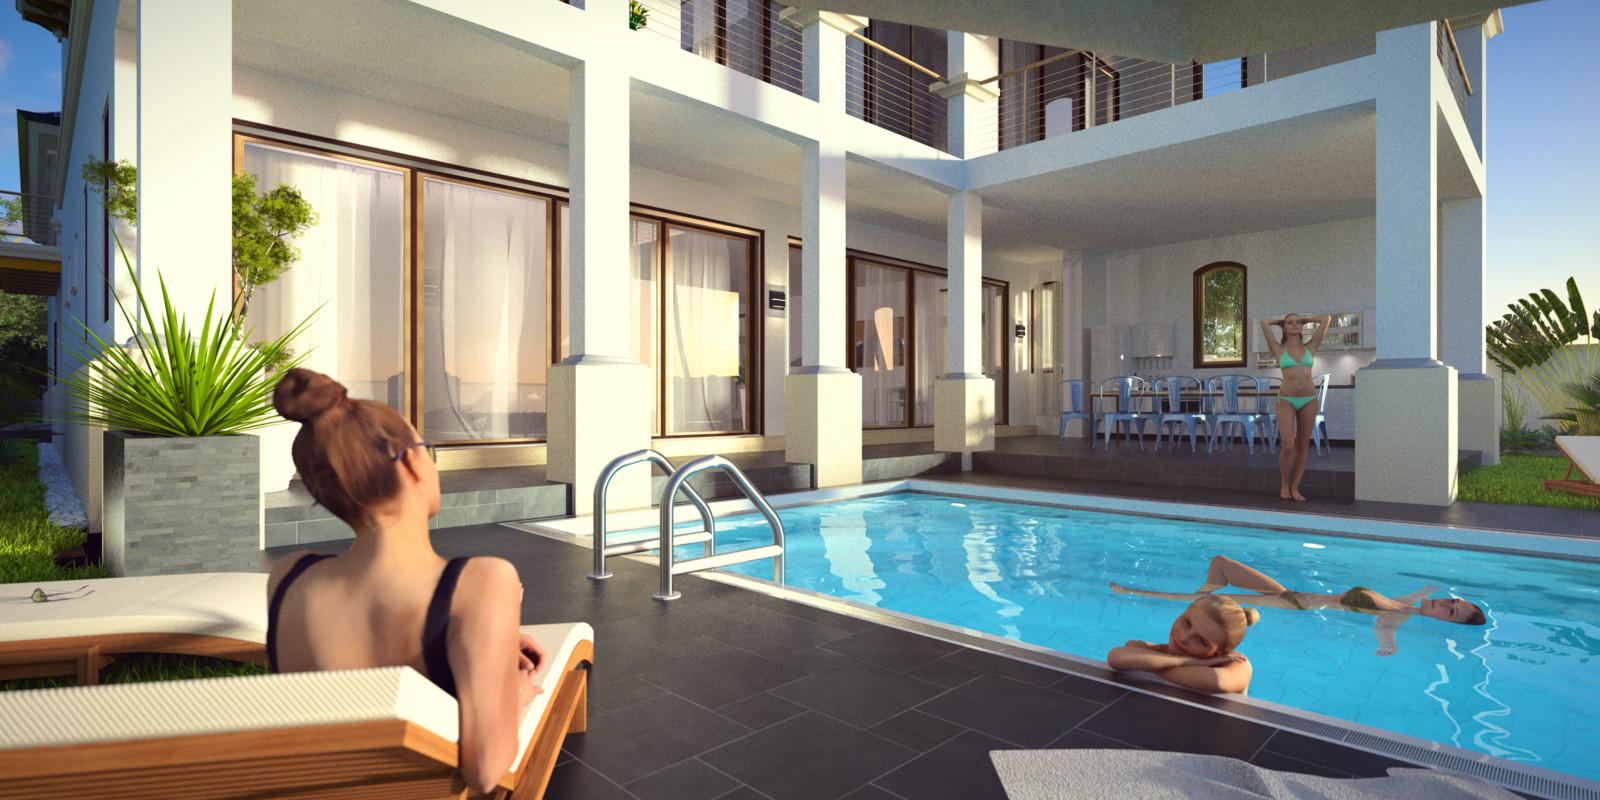 SketchUp + Thea Render  Seagrove Beach House: Scene 23 B Lumina Rise 2160 × 1080 Presto MC Bucket